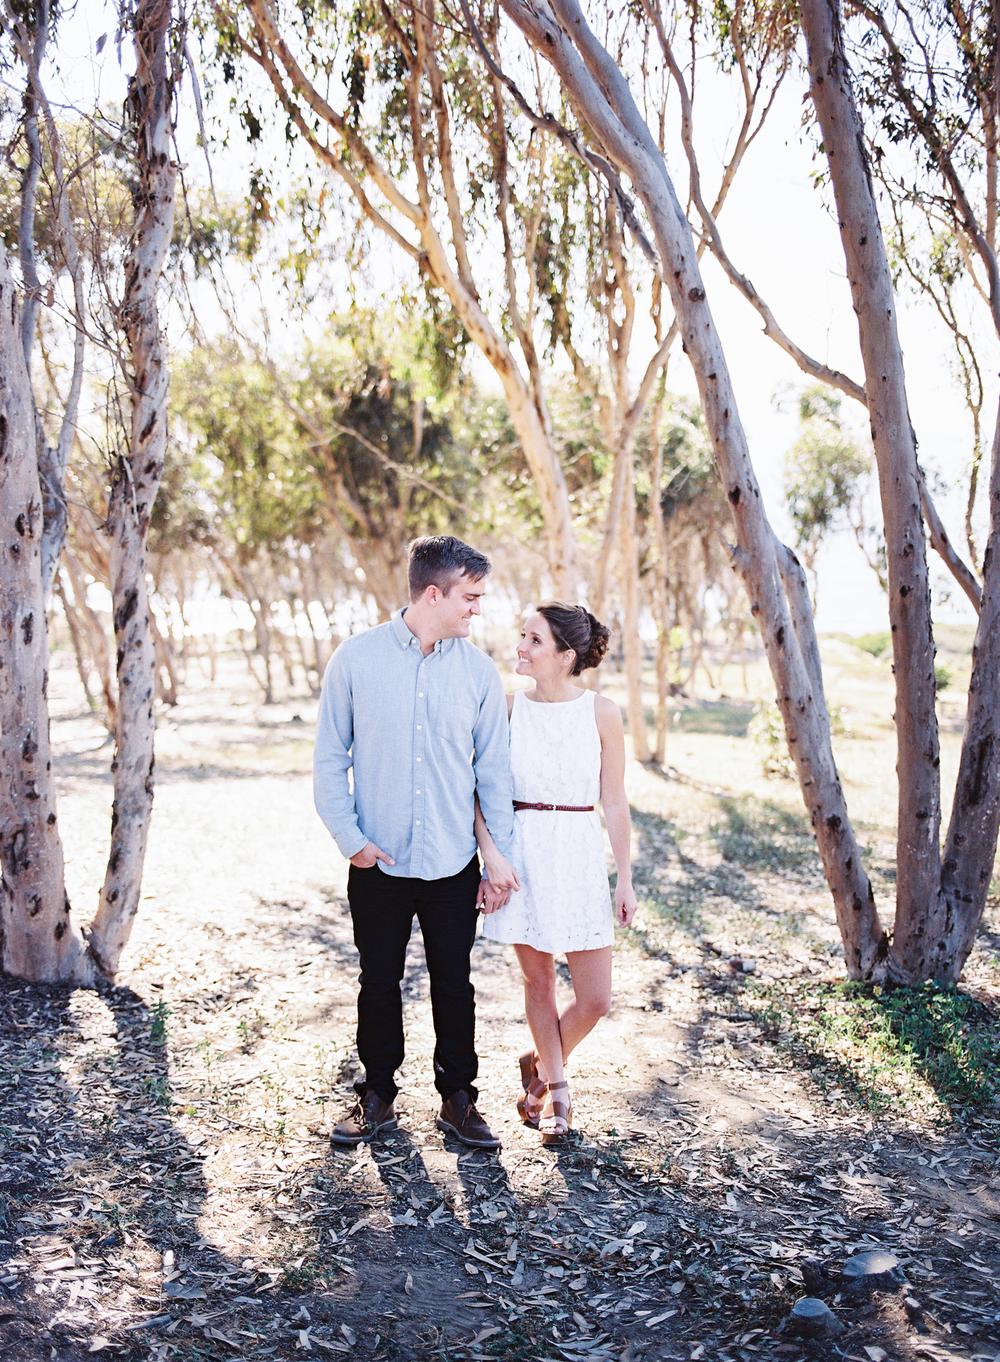 Jen_Wojcik_Photography-003.jpg